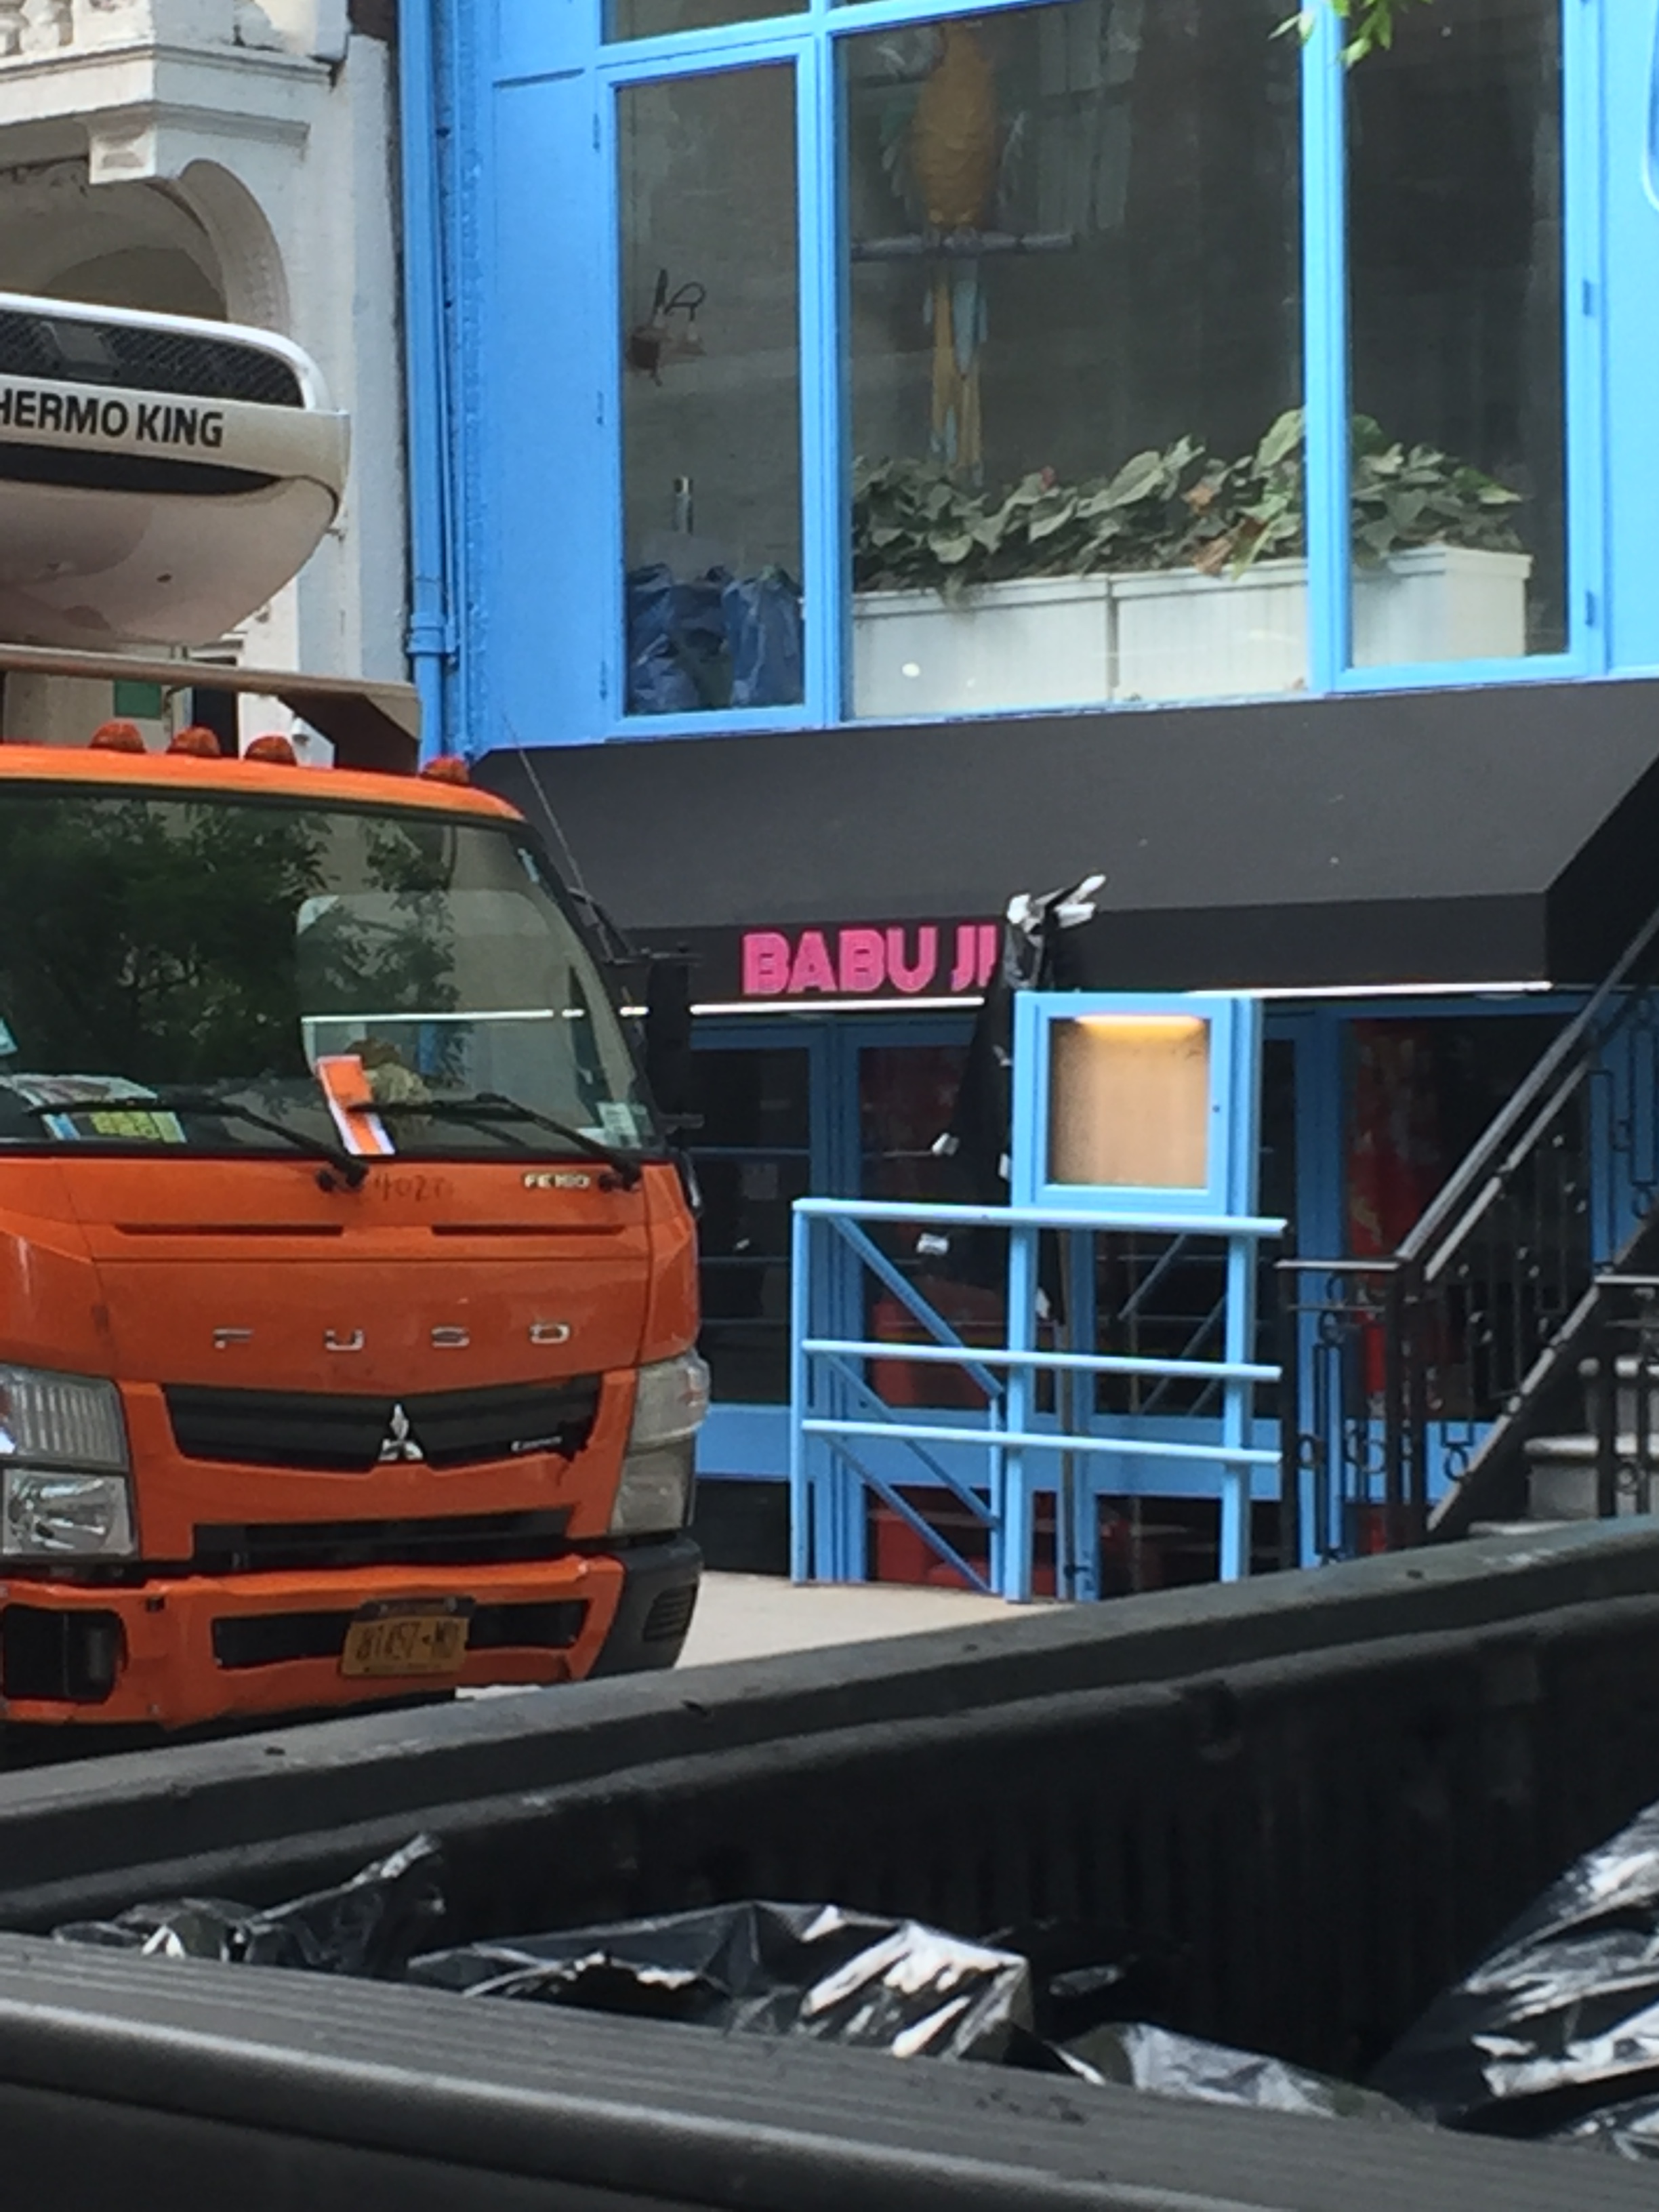 Babu Ji signage at 22 East 13th Street